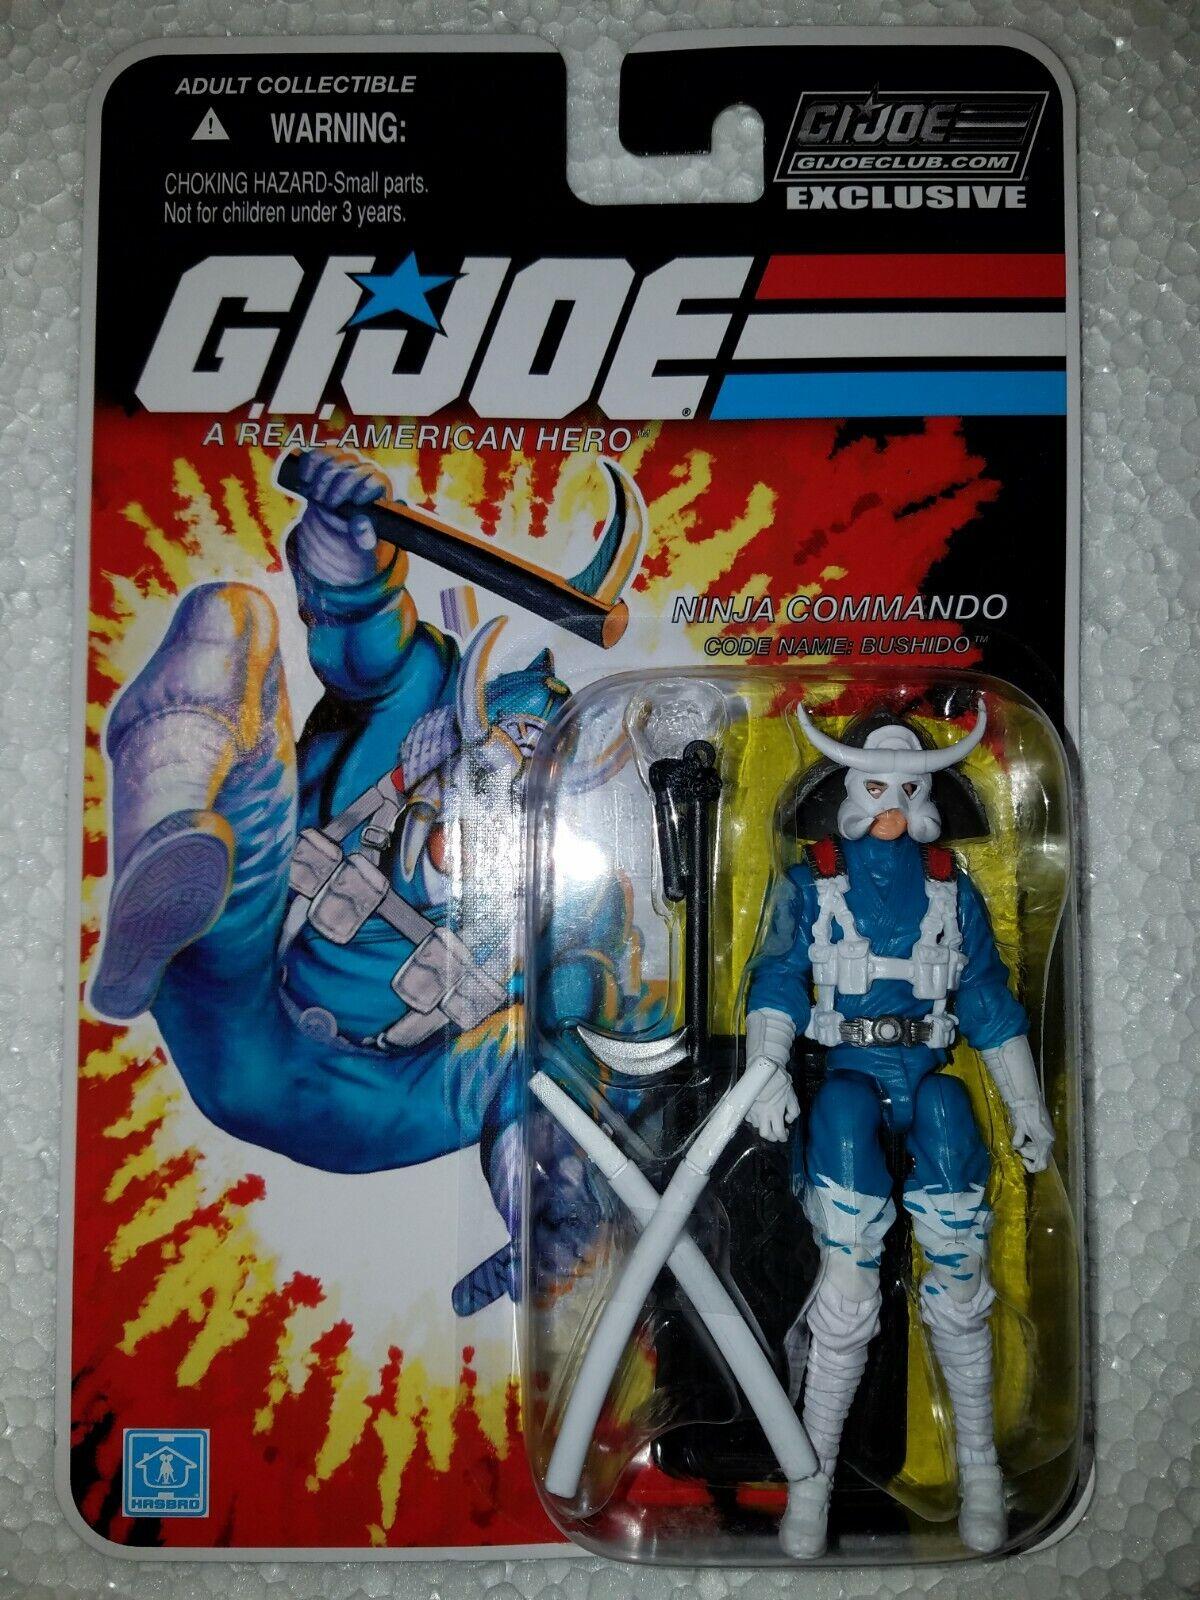 G.I. Joe exclusivo club FSS 8.0  Bushido-Ninja COMMANDO